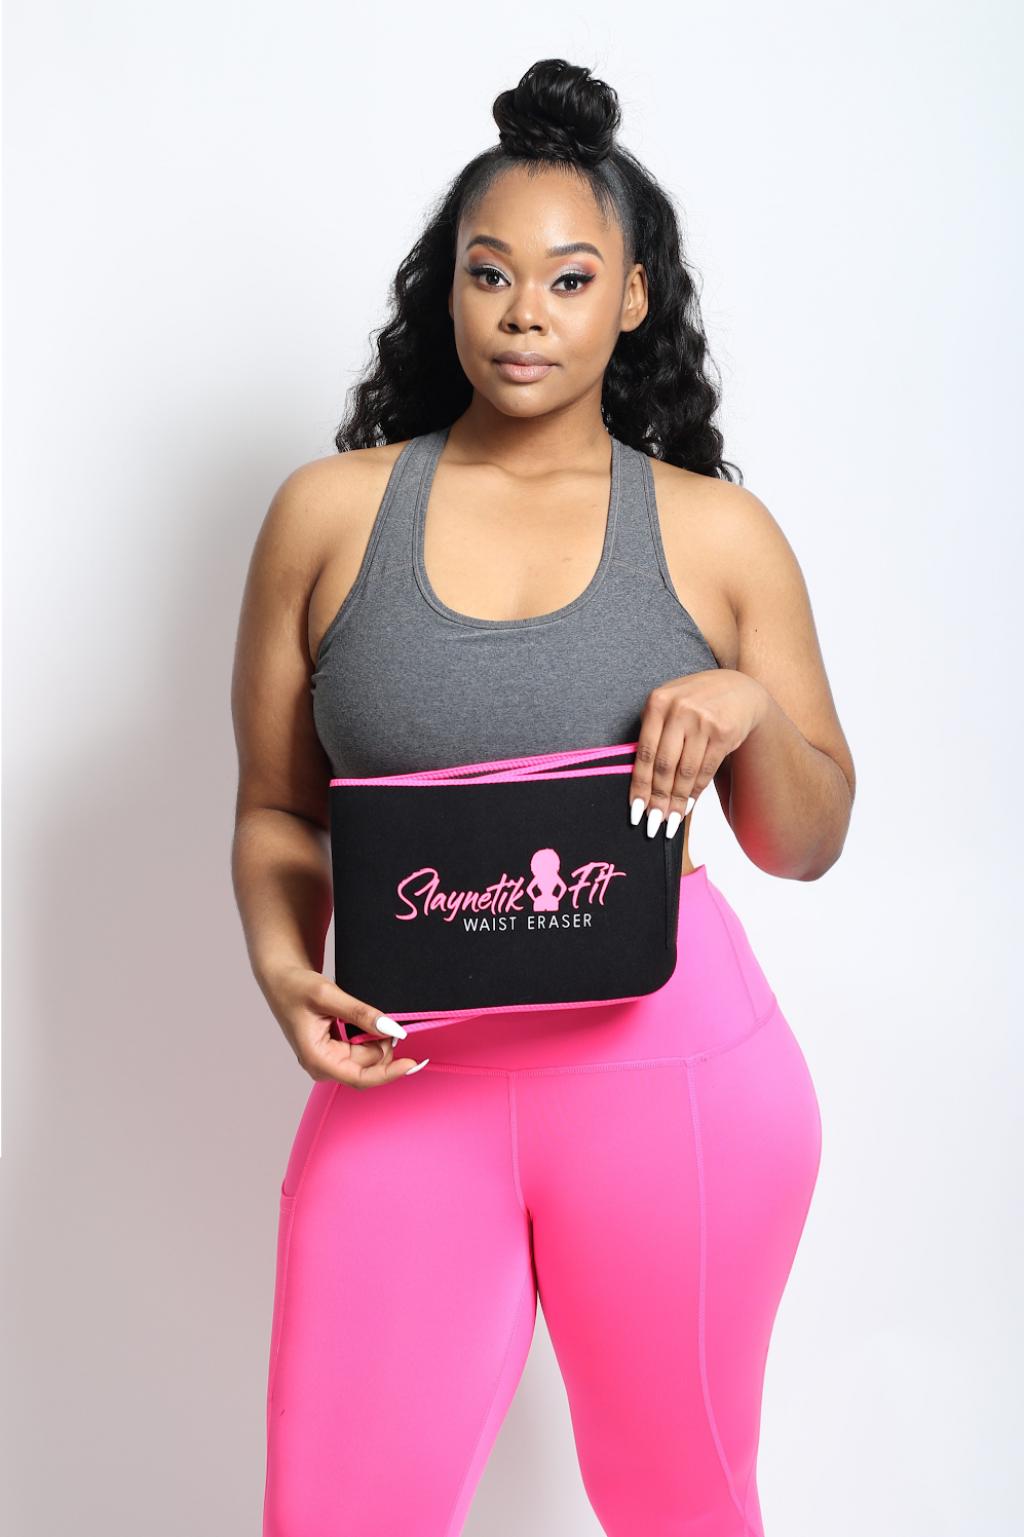 FAMU alumna set to launch fitness brand